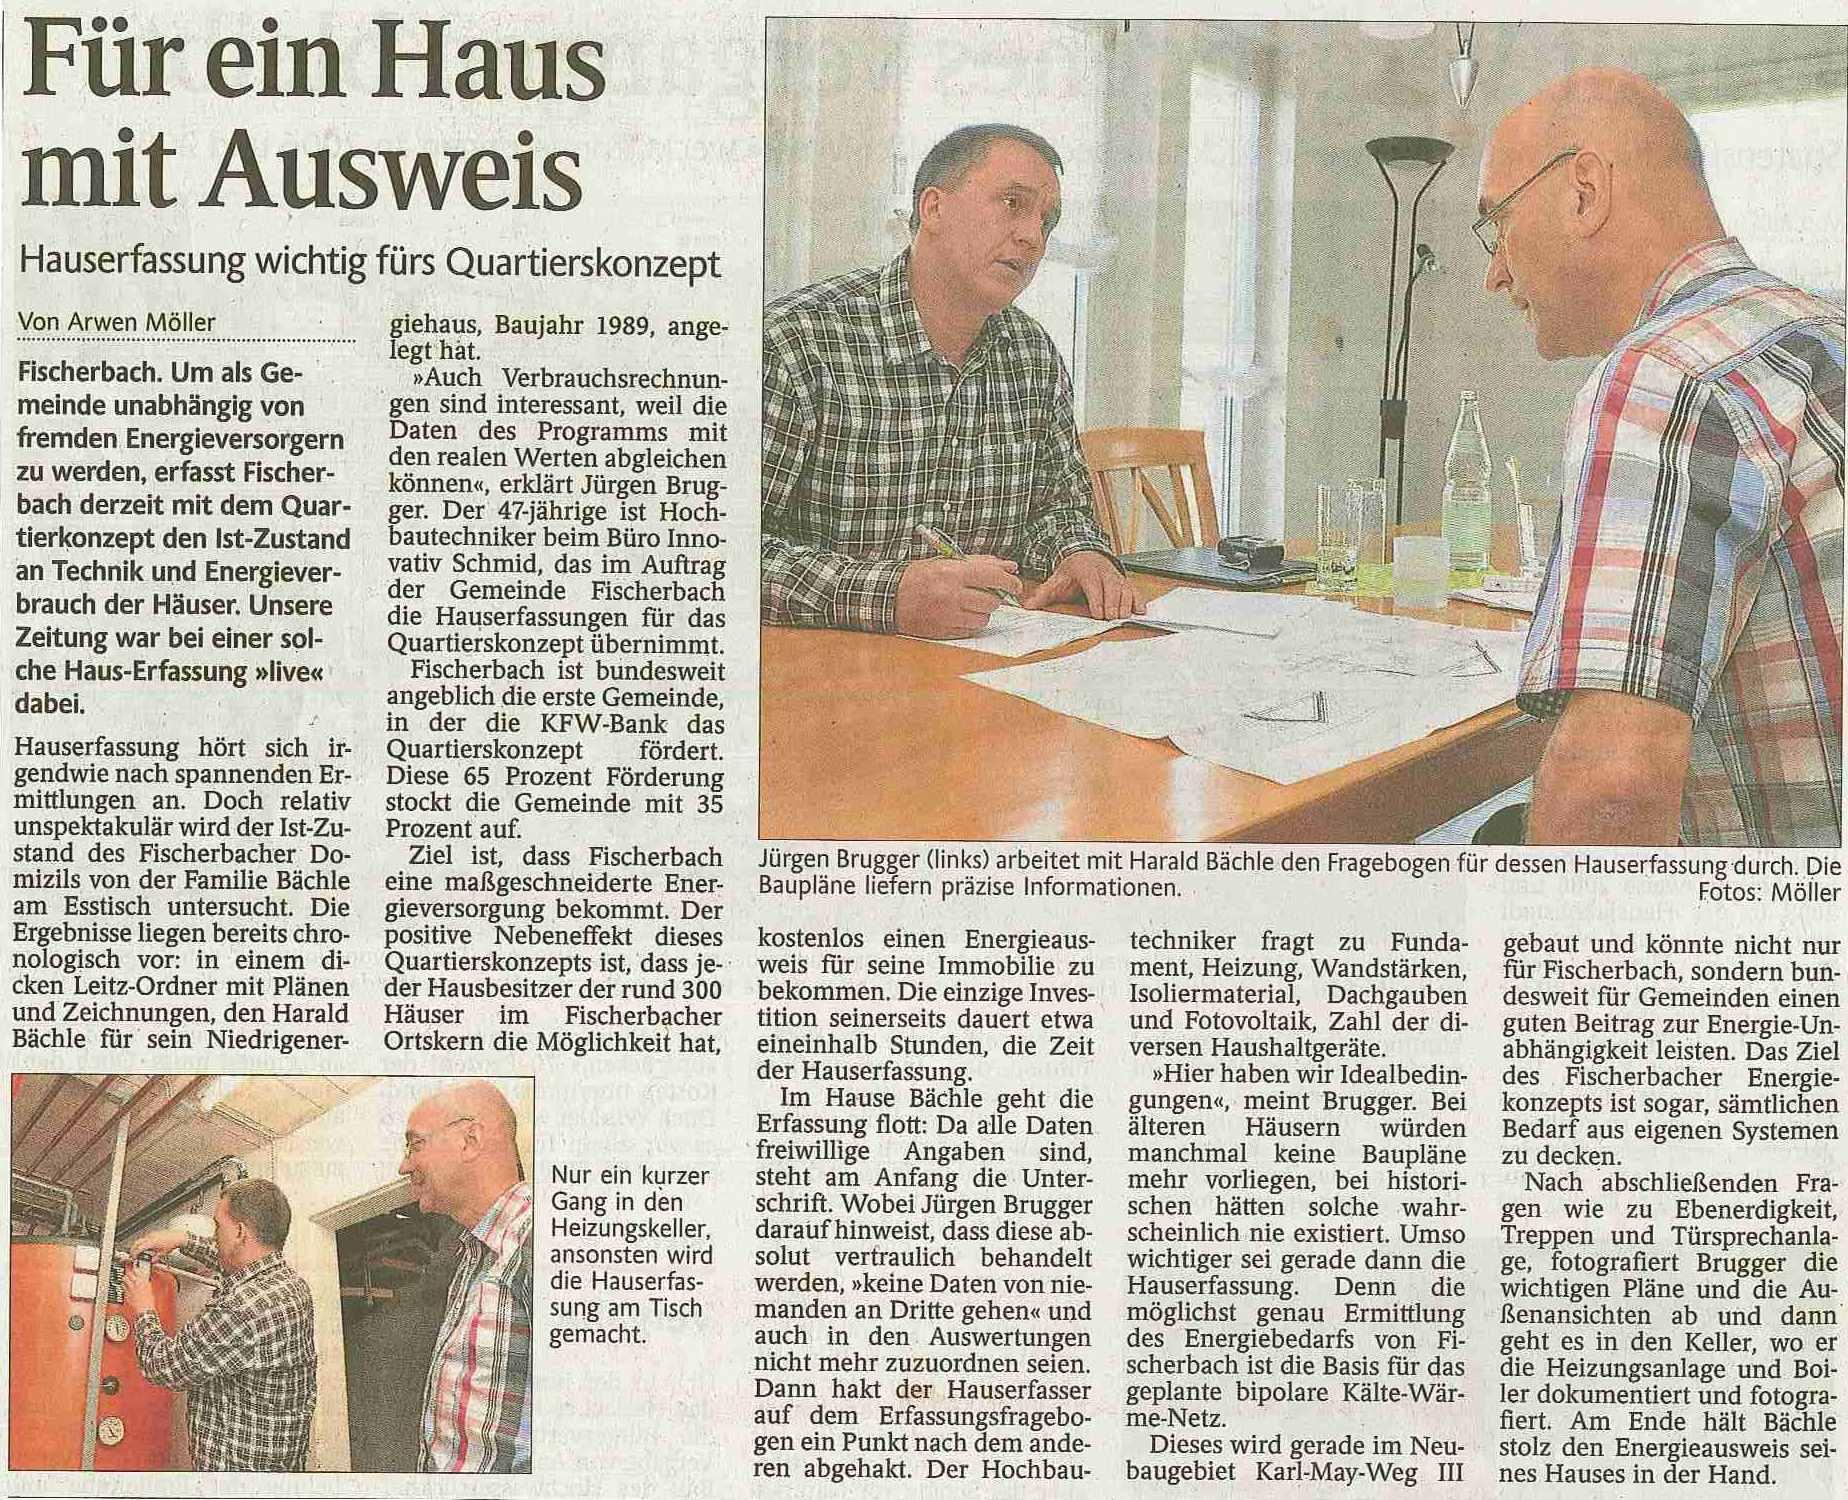 Harald Baechle Wiesenrain 1